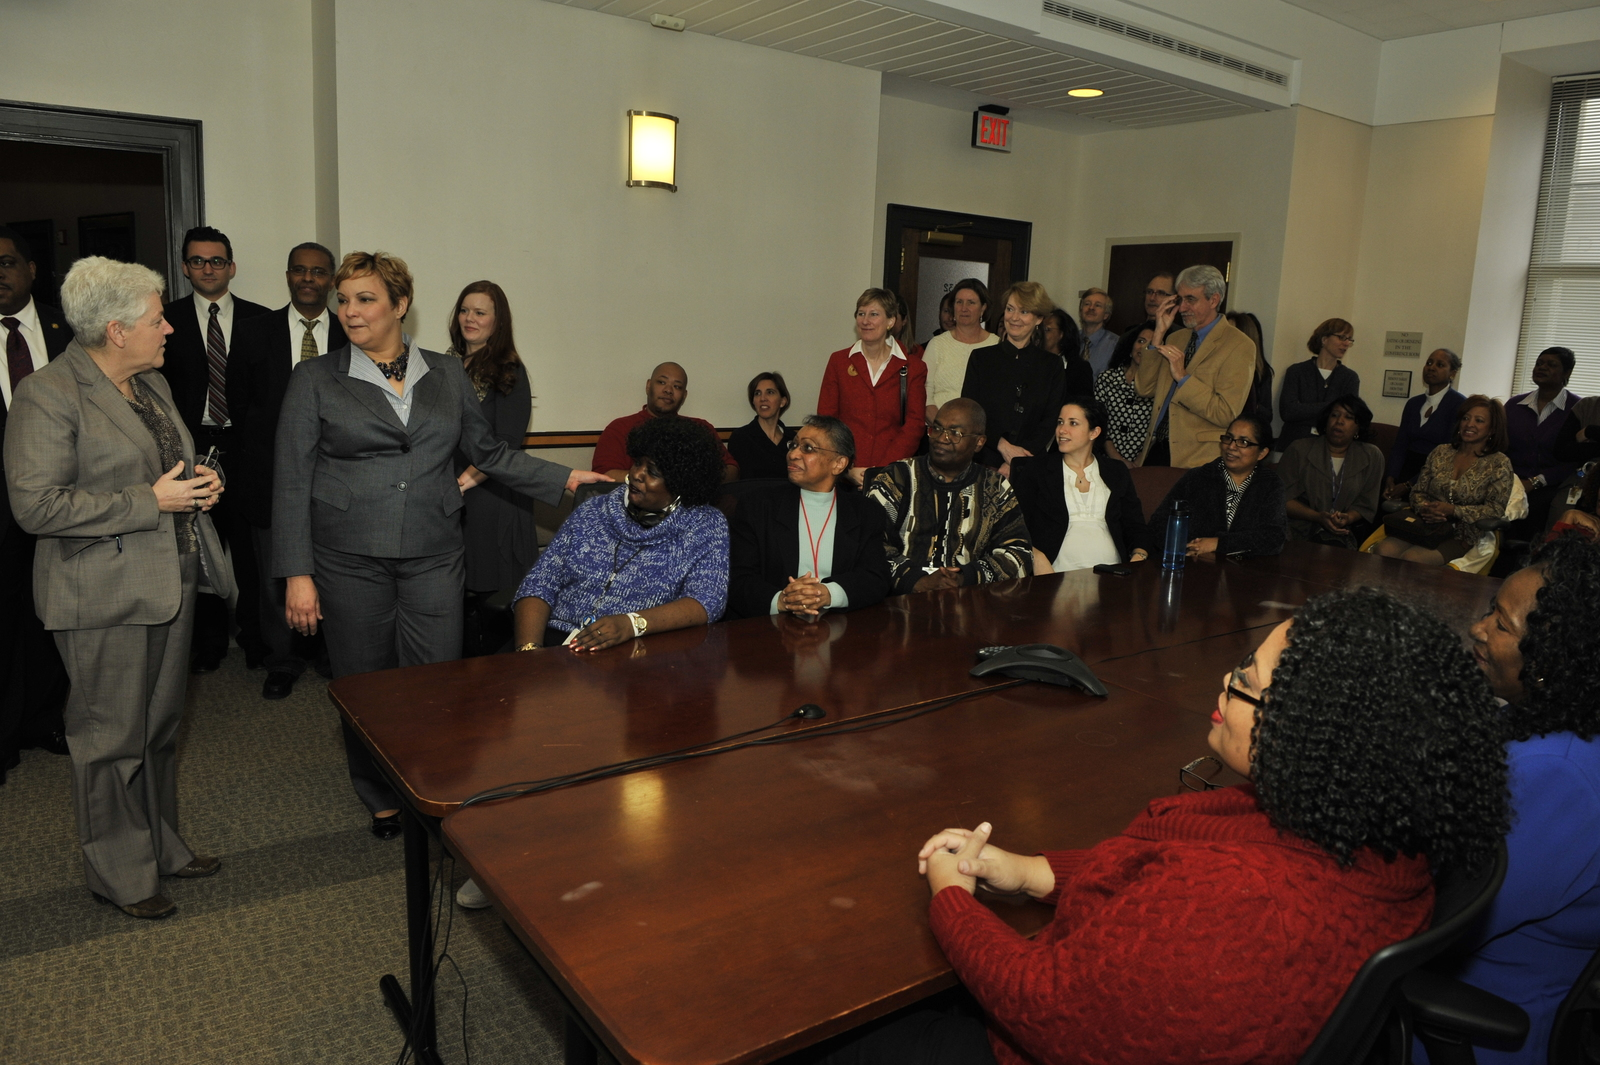 Office of the Administrator - Lisa Jackson's Farewell Tour [412-APD-1115-2013-02-07_FarewellTour_142.JPG]